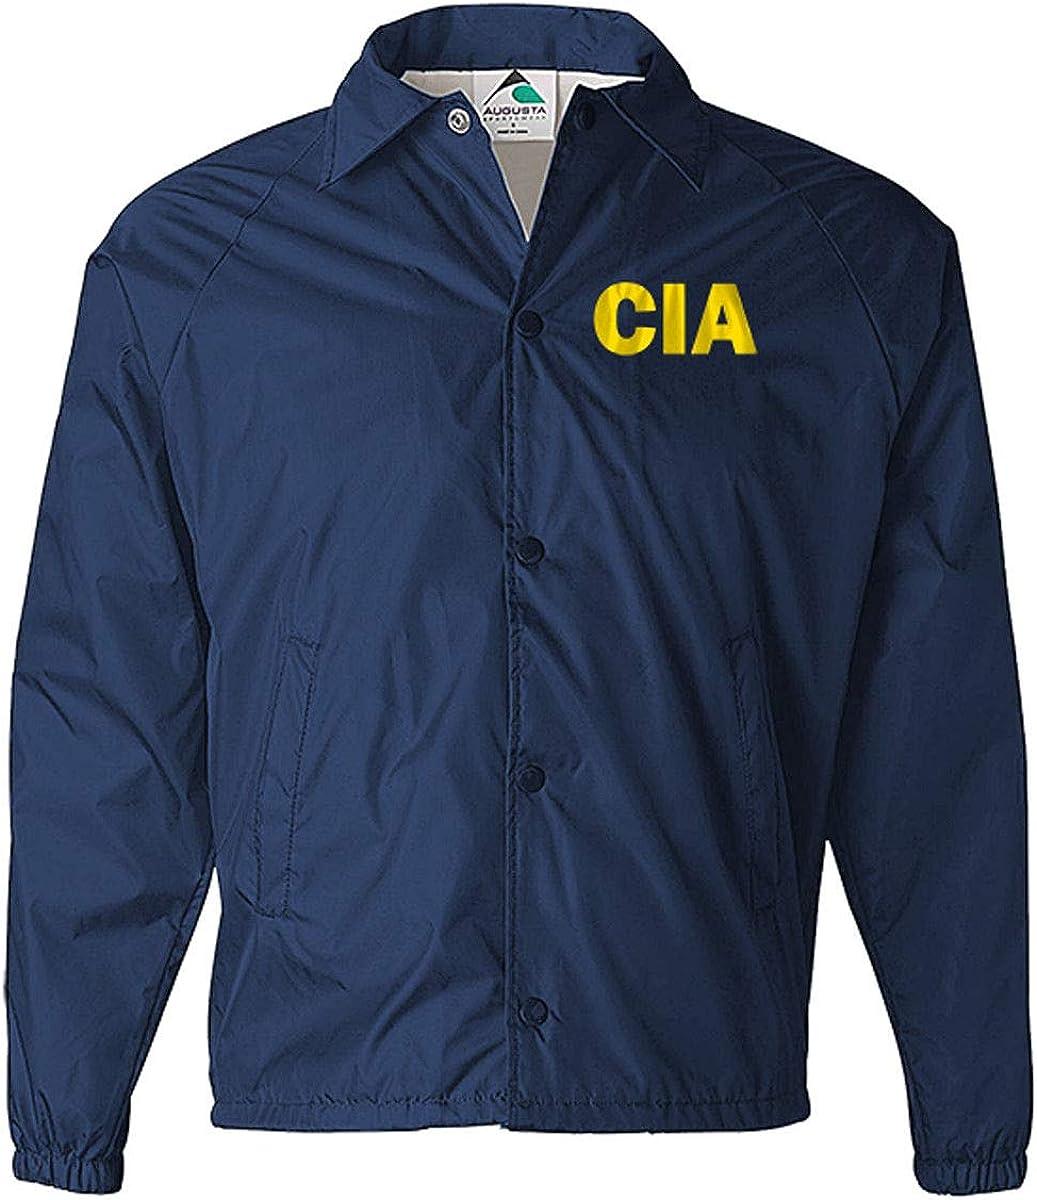 CIA Jacket Windbreaker, Government Agent Jacket, Secret Service Jacket